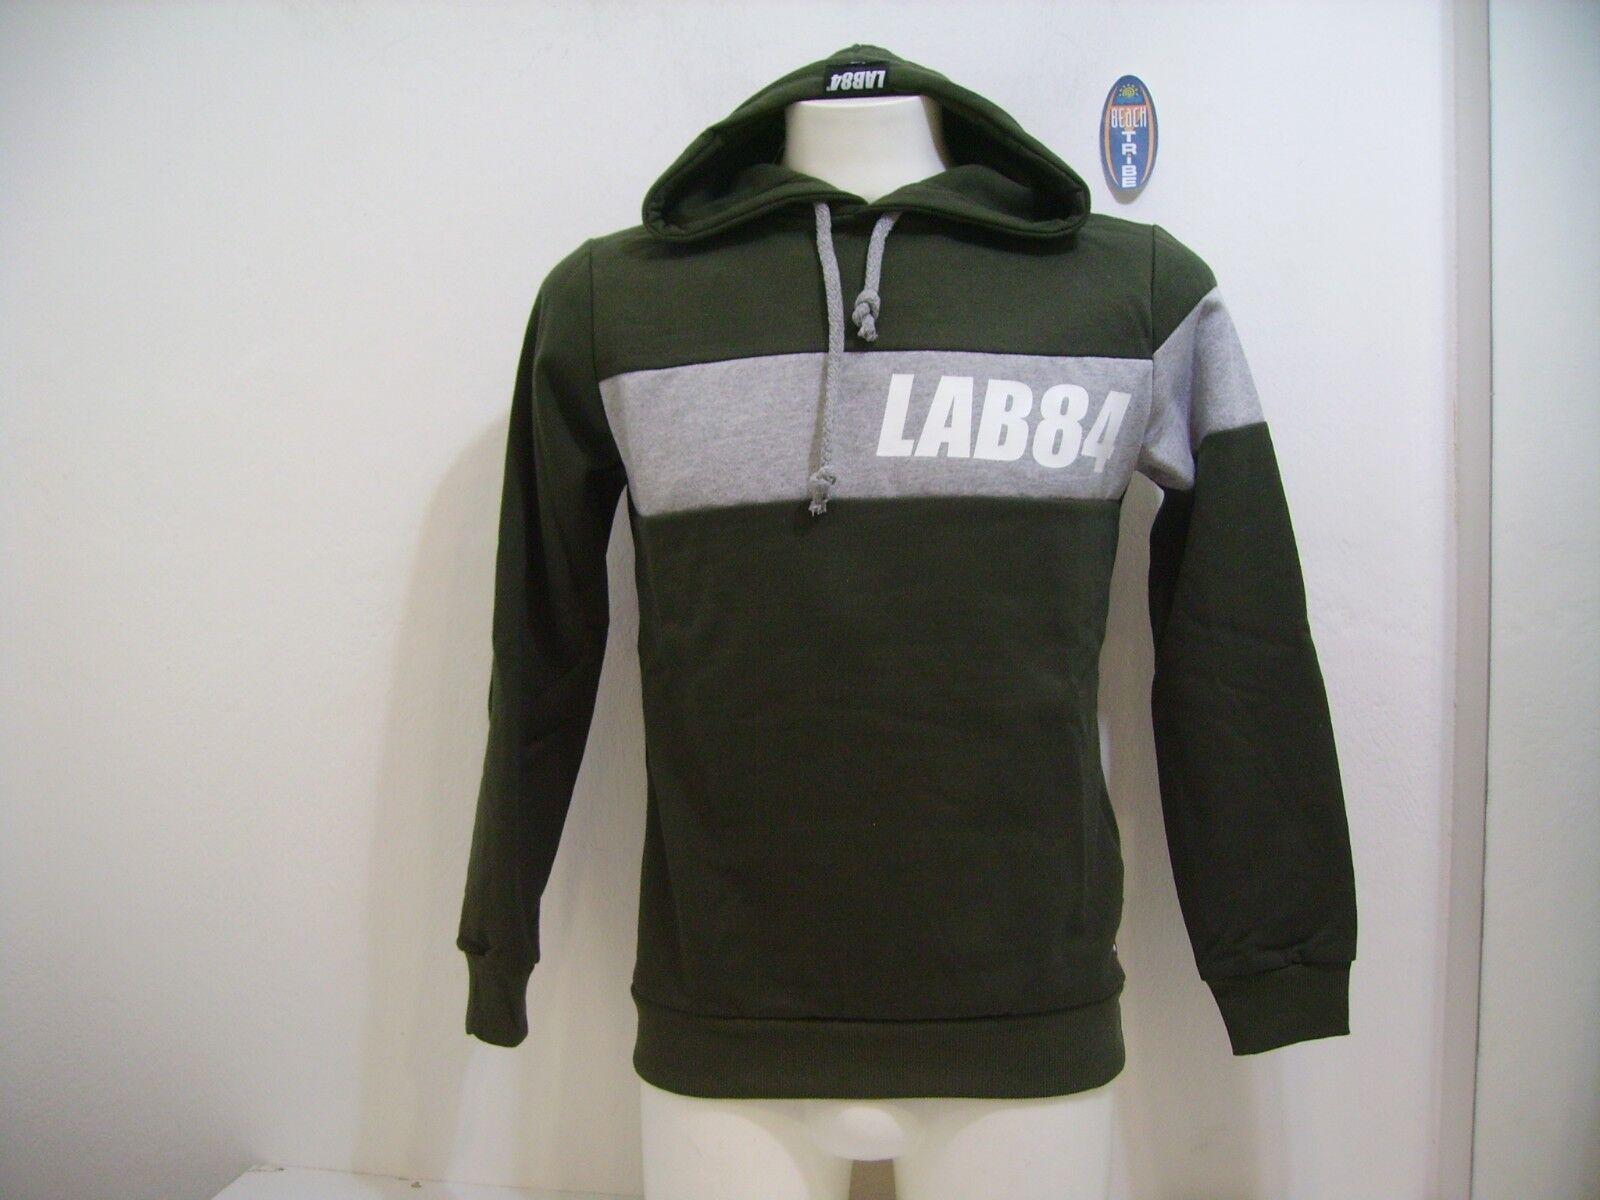 Lab84 Herren Sweatshirt Hood Closed Winter F8 FLPM0321 Military Grün Größe S